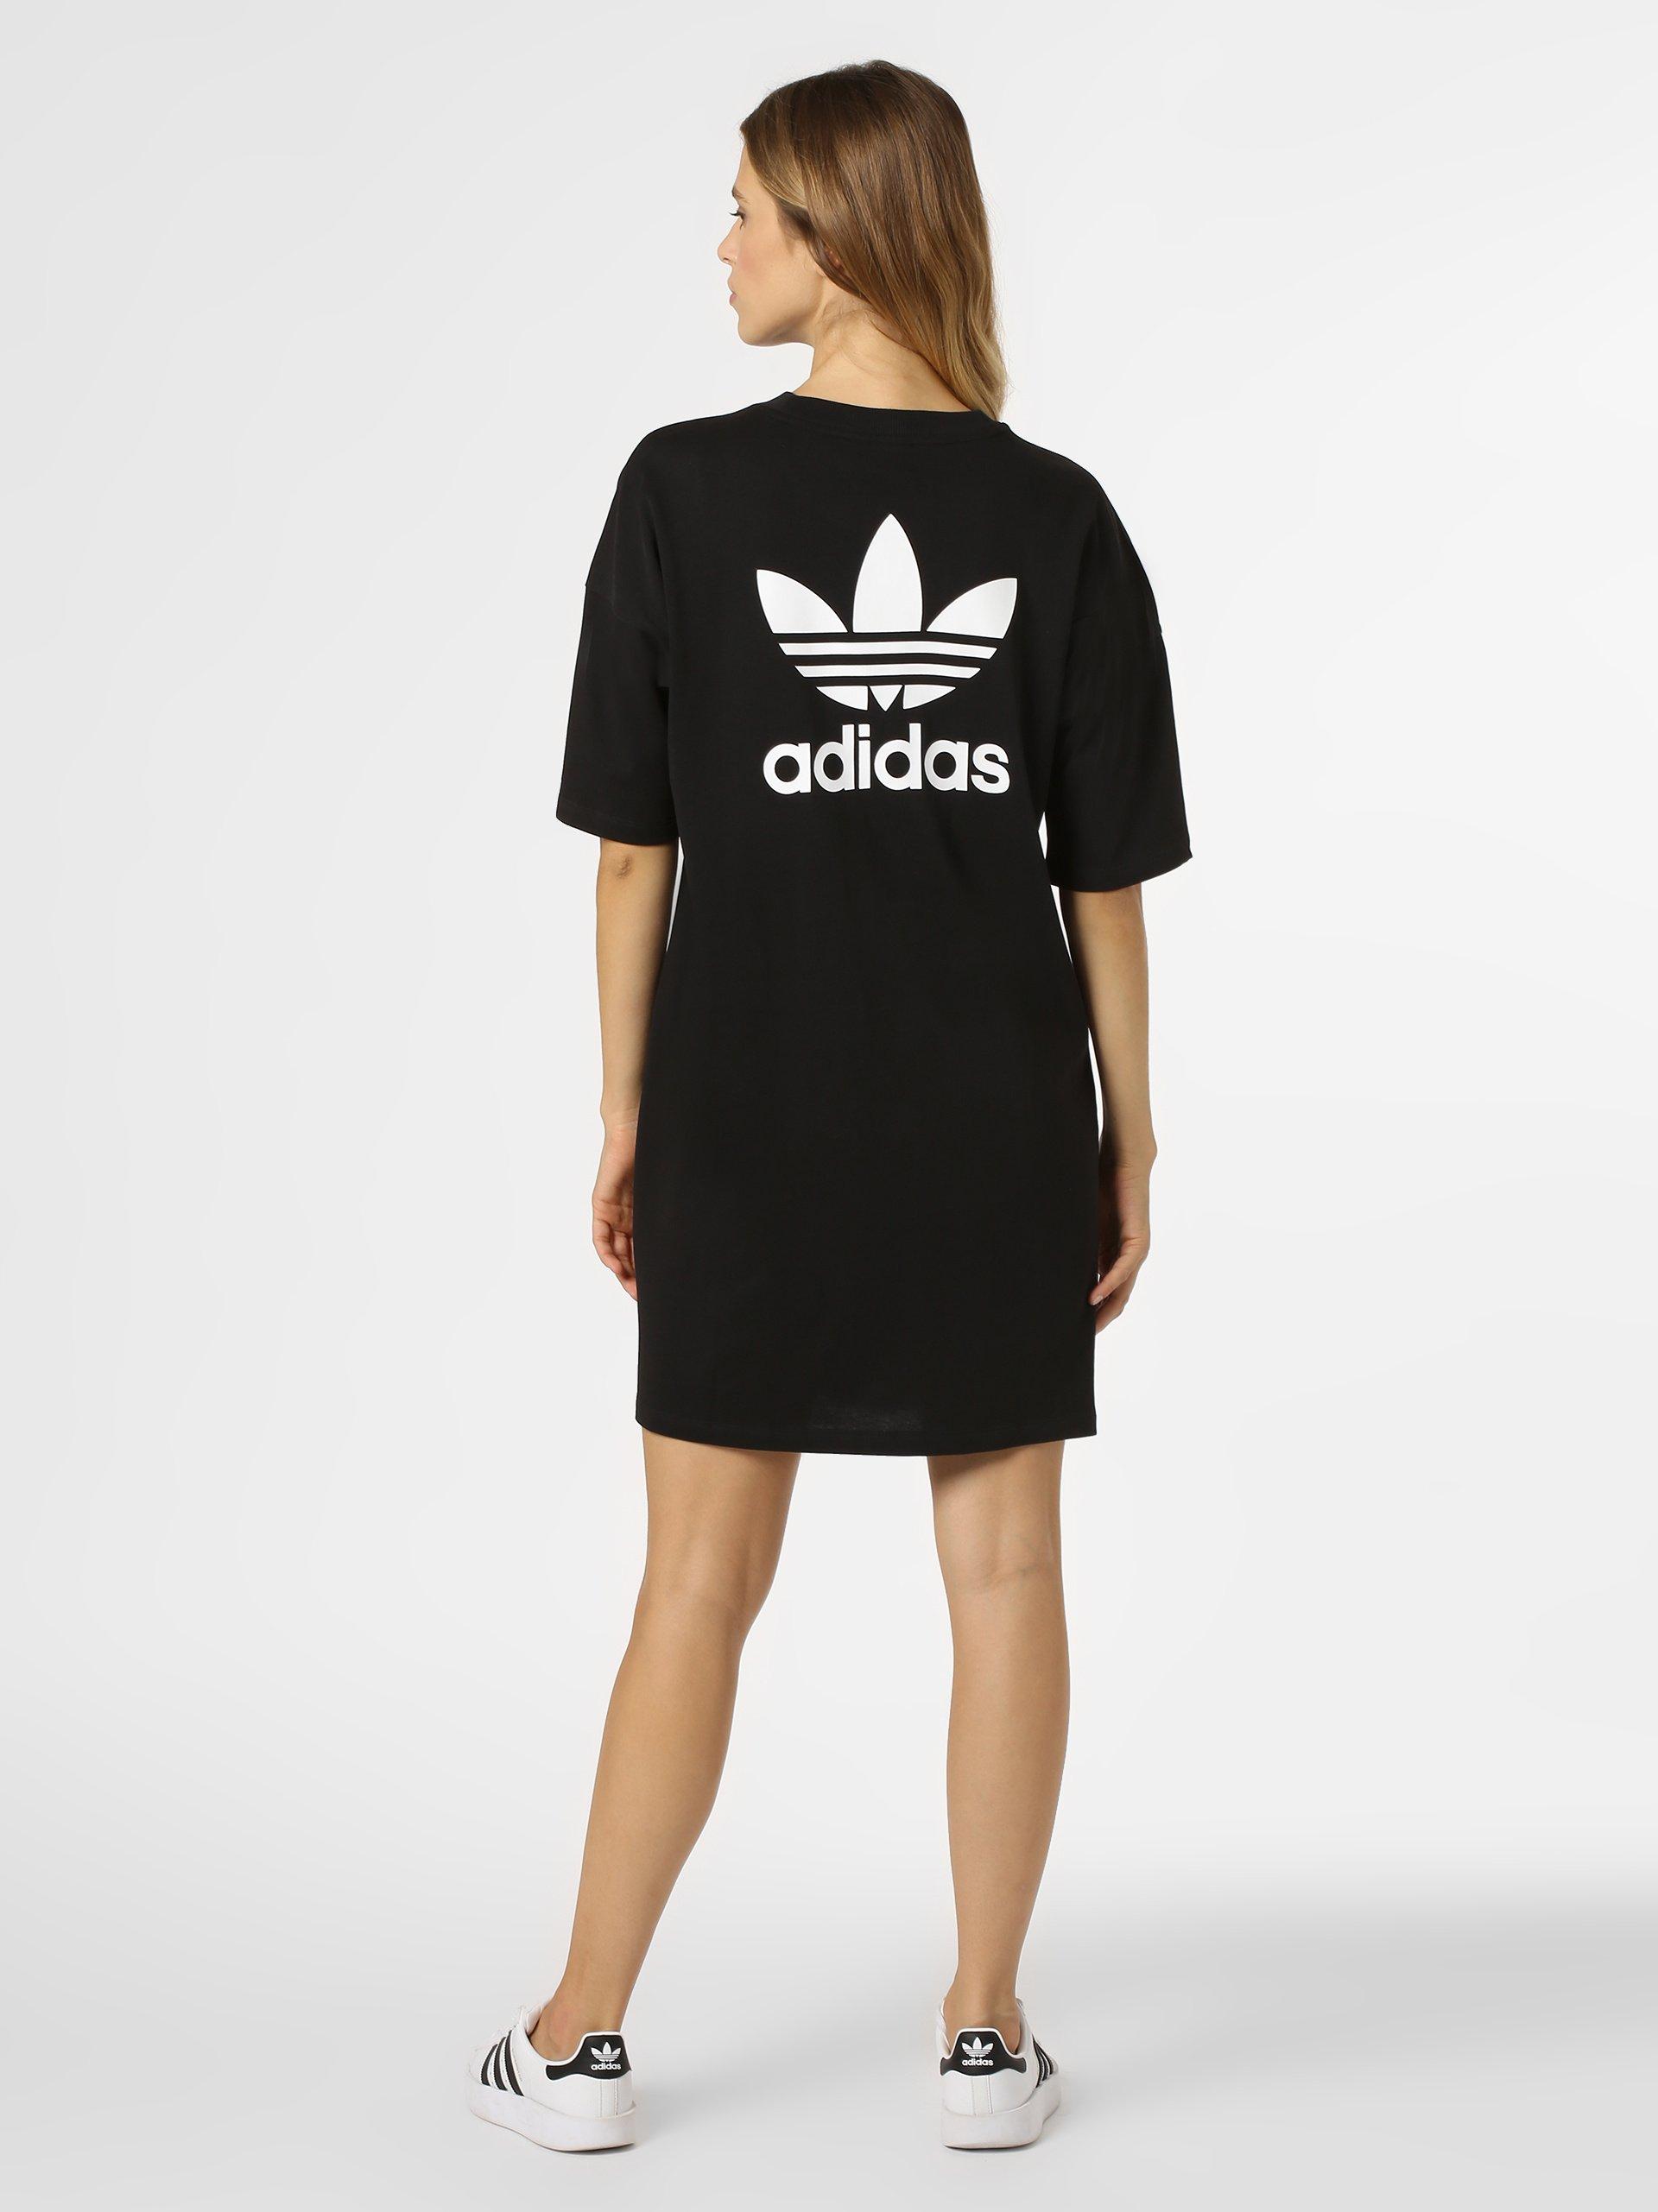 adidas Originals Damen Kleid